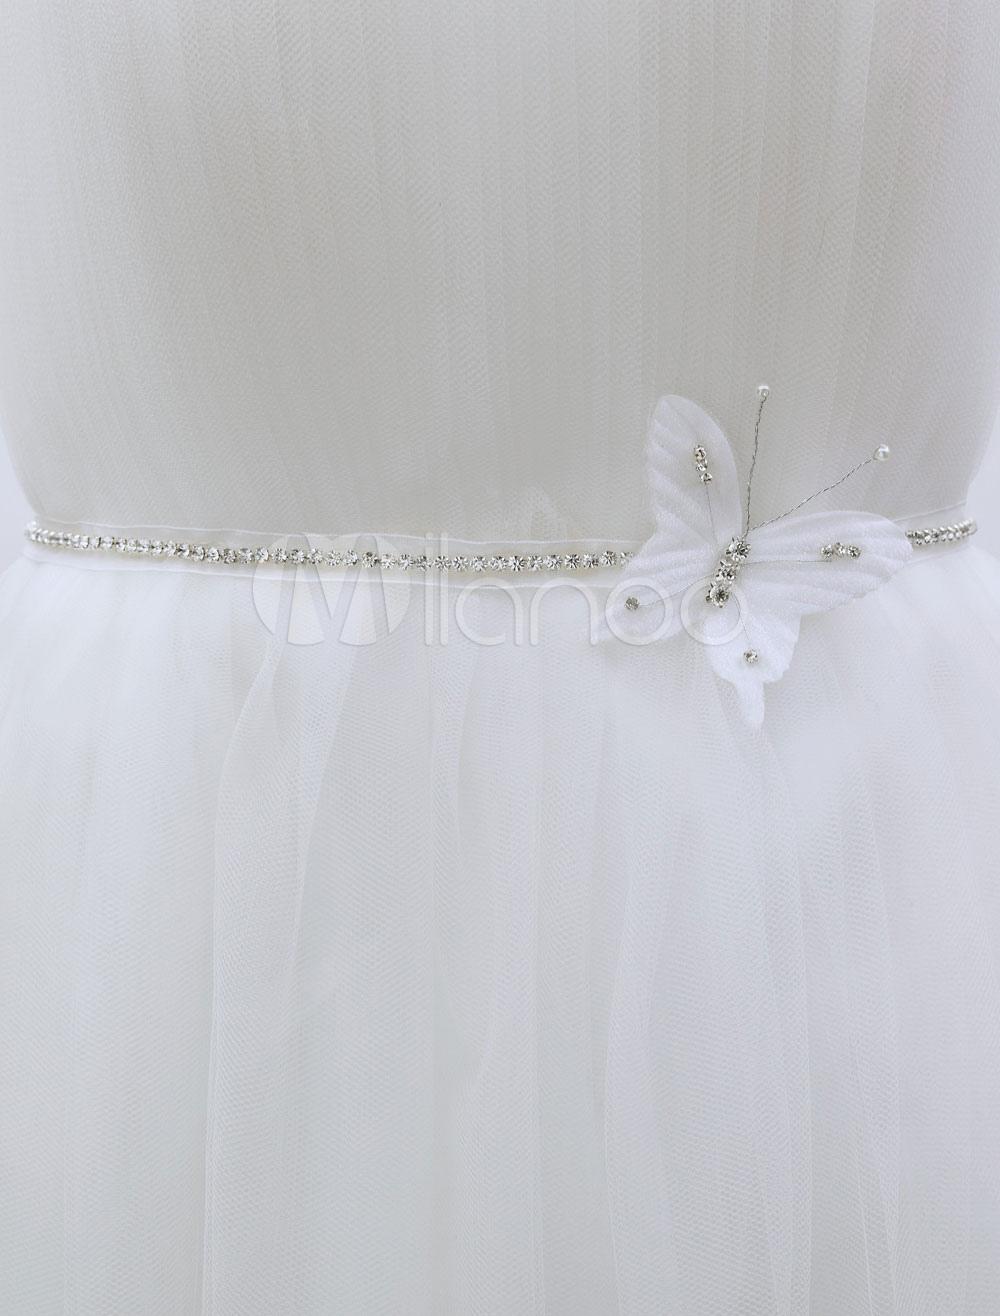 Buy Glitter Wedding Sash White Rhinestone Bow Bridal Sash For Decor for $8.79 in Milanoo store